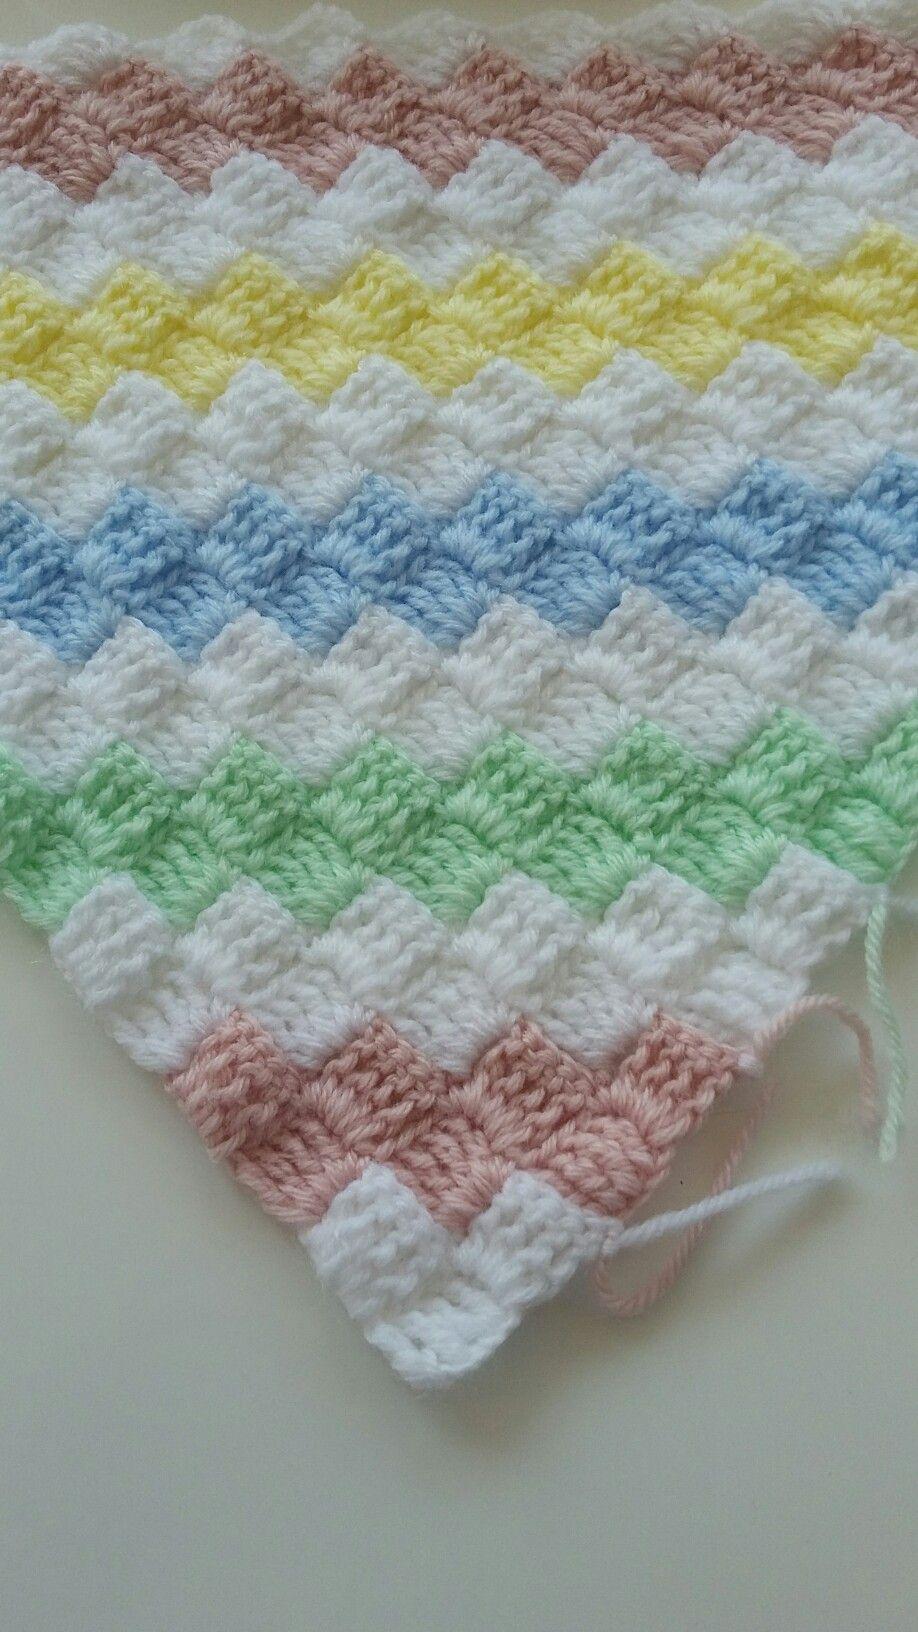 Renkli Bebe battaniyesi